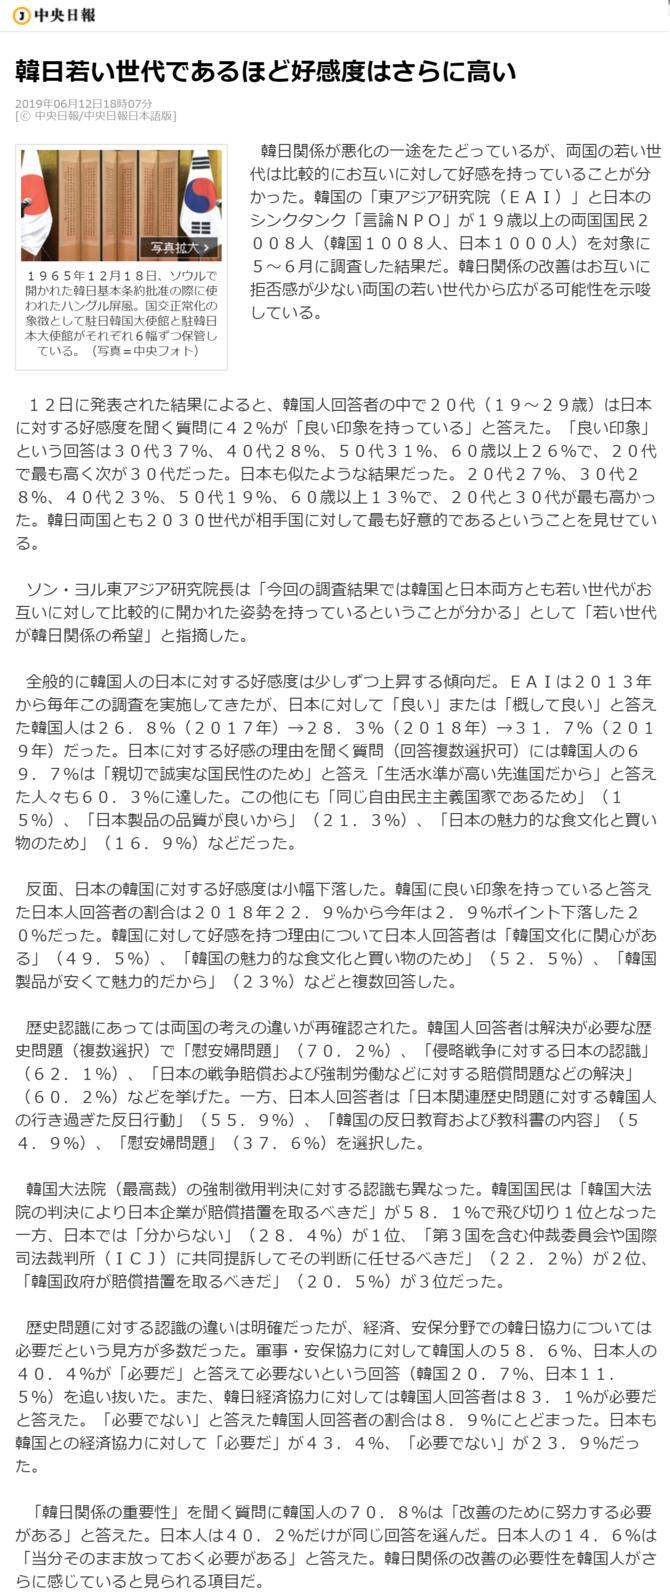 中央日報_1.png